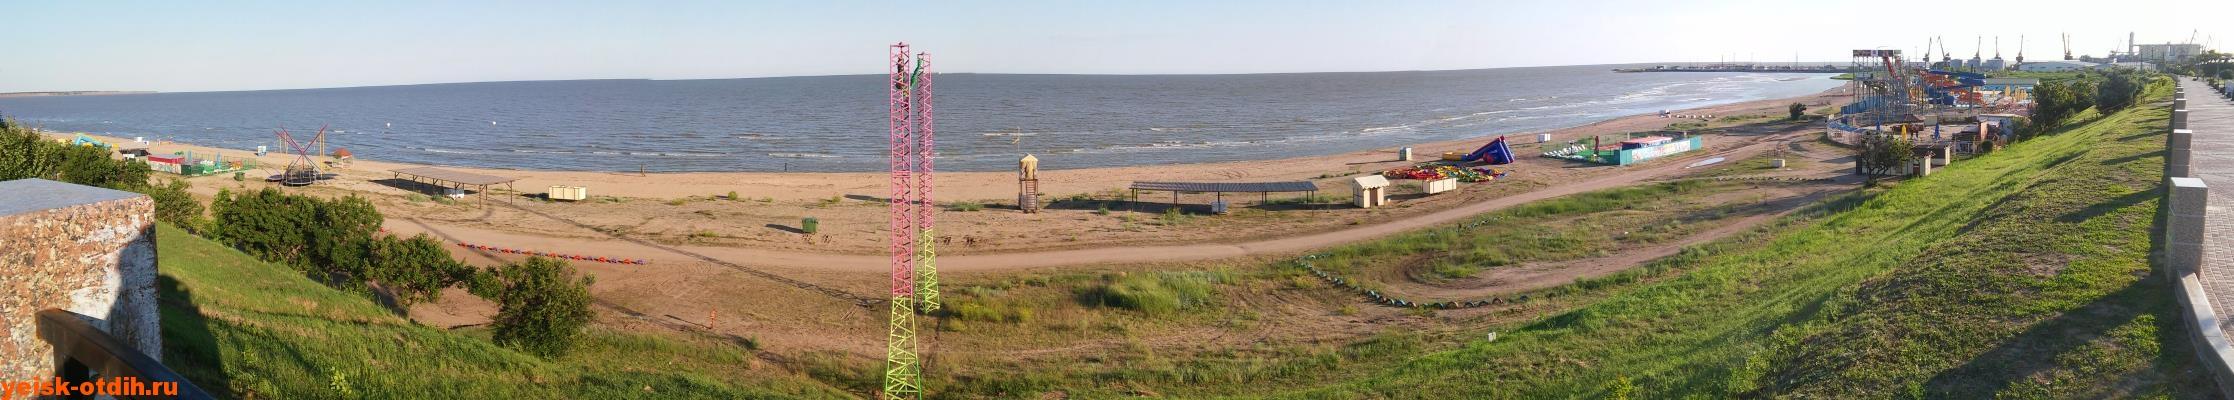 Панорама песчаной части пляжа Каменка Ейск